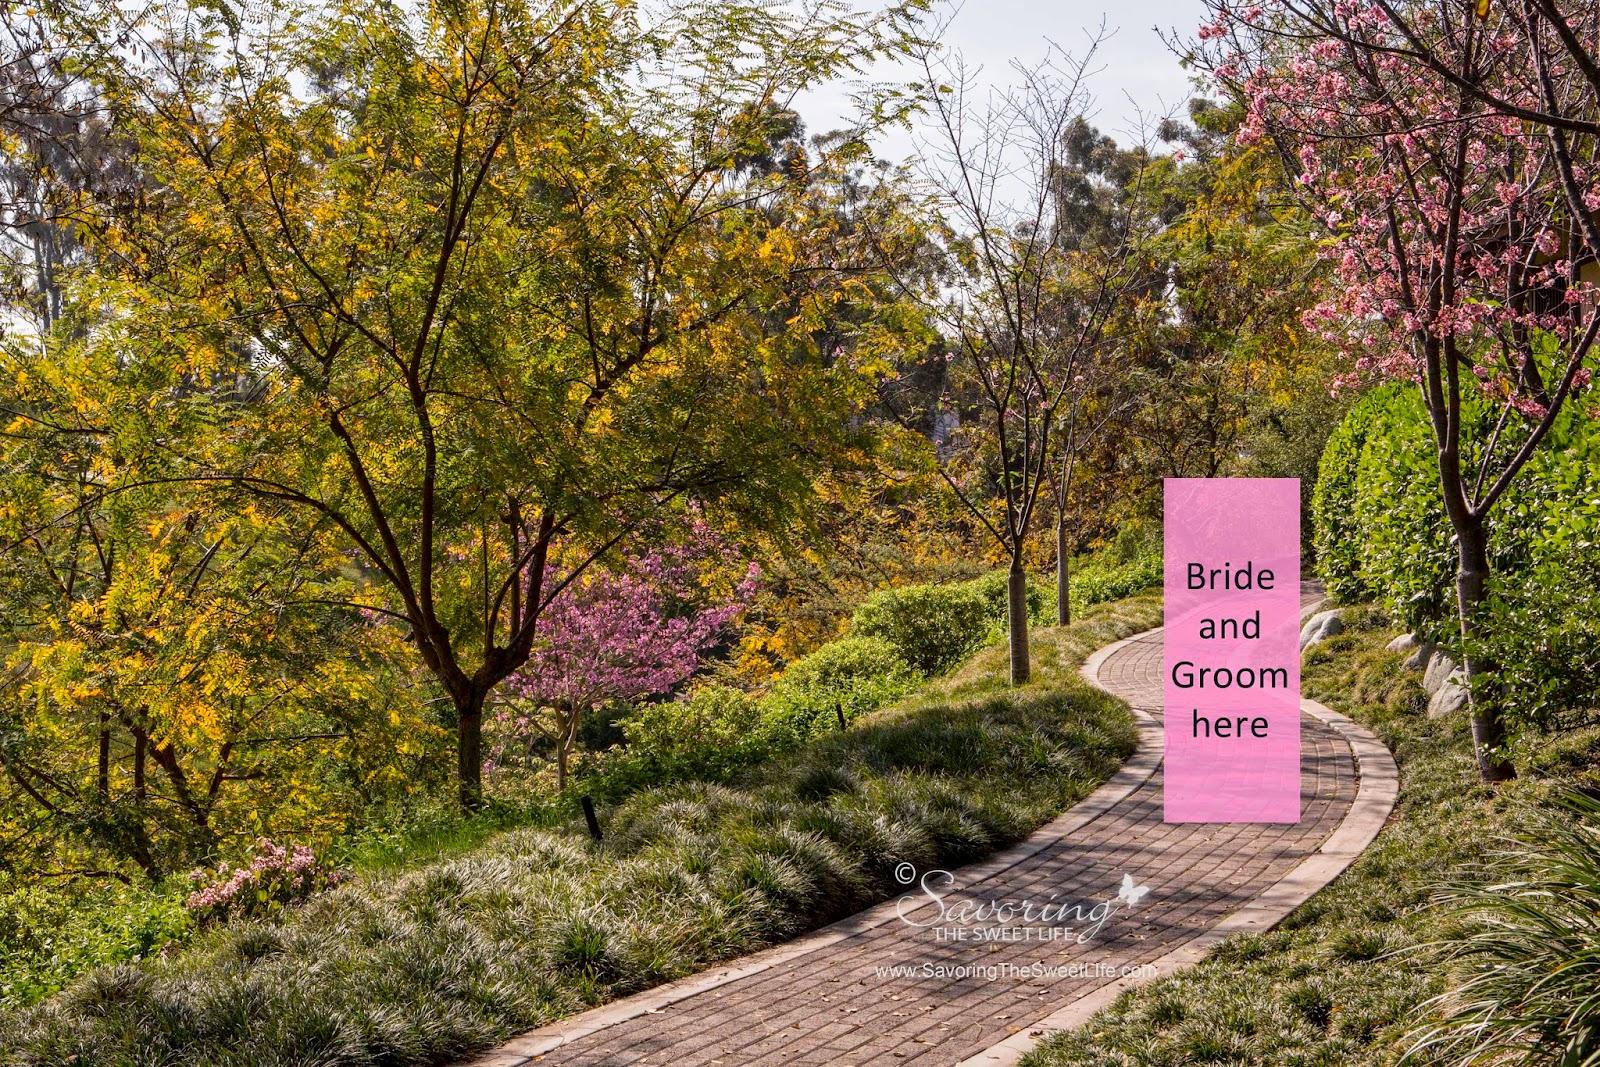 Savoring the sweet life balboa park 39 s japanese friendship for Japanese friendship garden